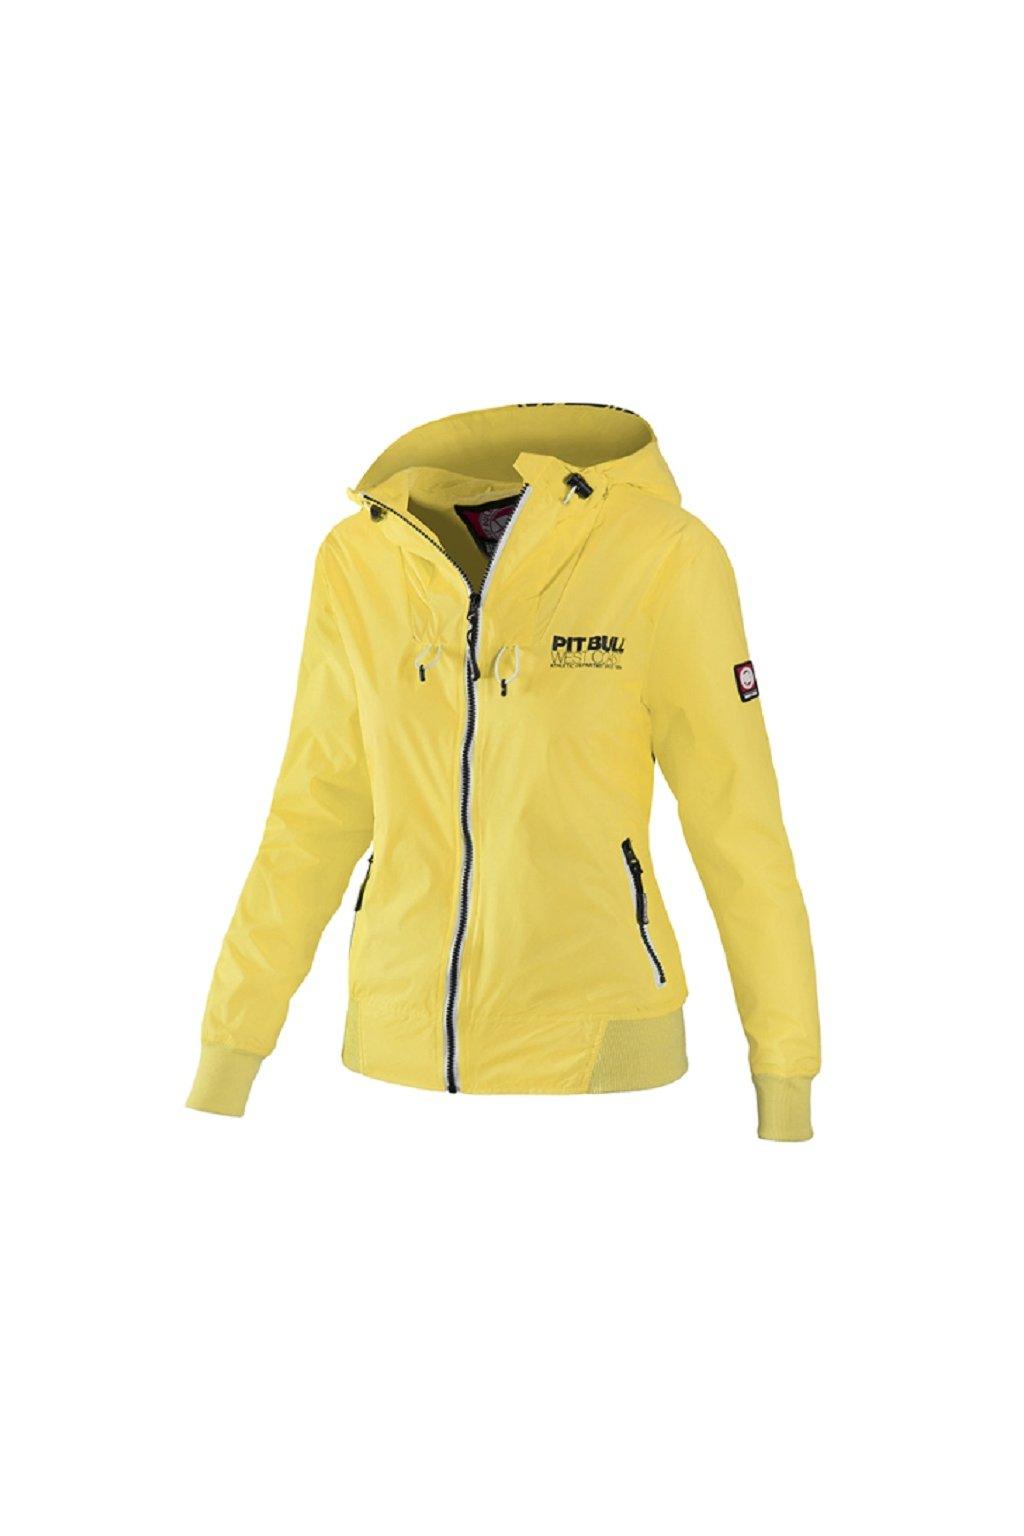 PitBull West Coast - dámská letní bunda AARICIA 3 žlutá obr1